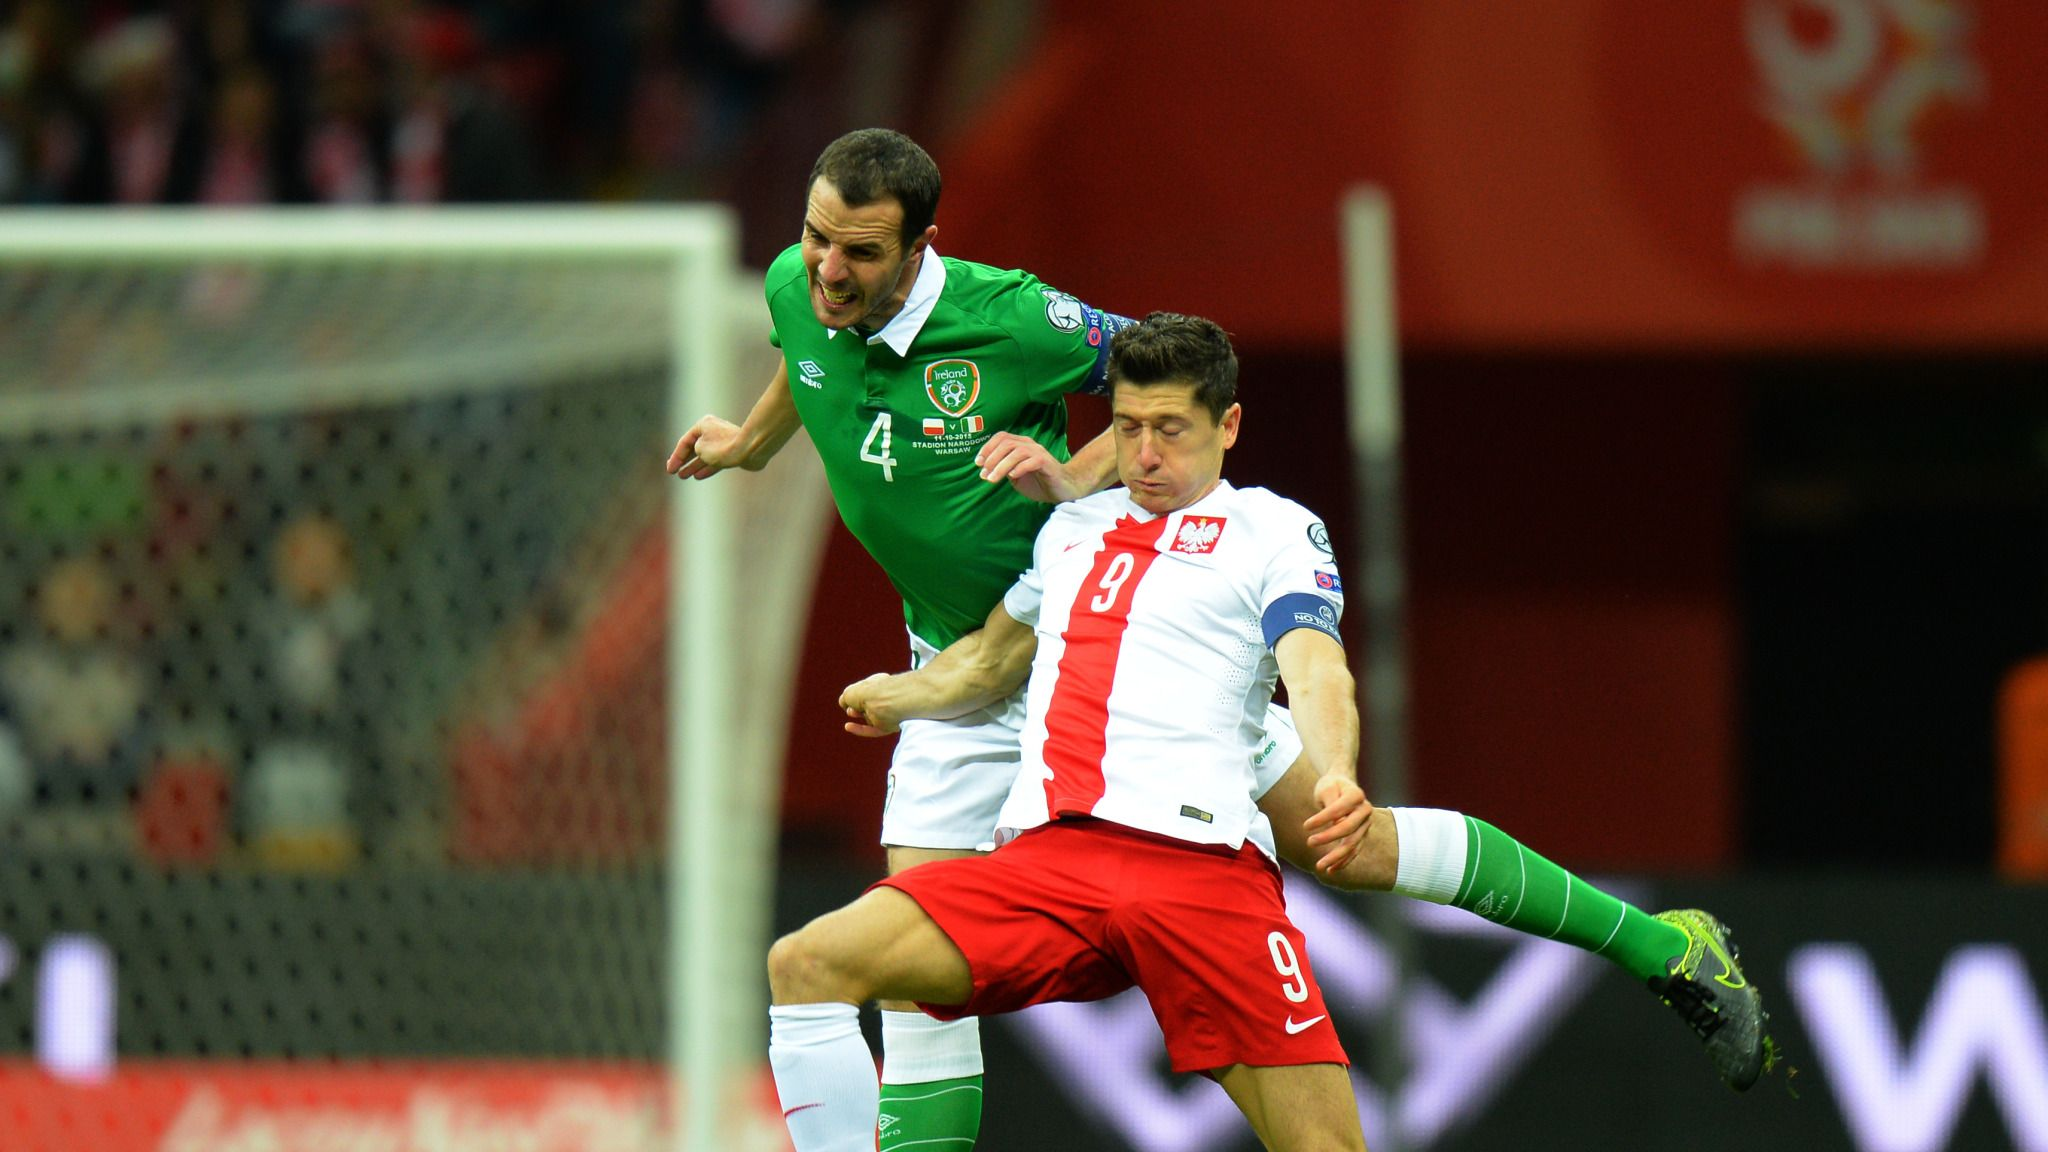 Goals Of The Night Joao Moutinho And Robert Lewandowski Feature Football News Sky Sports